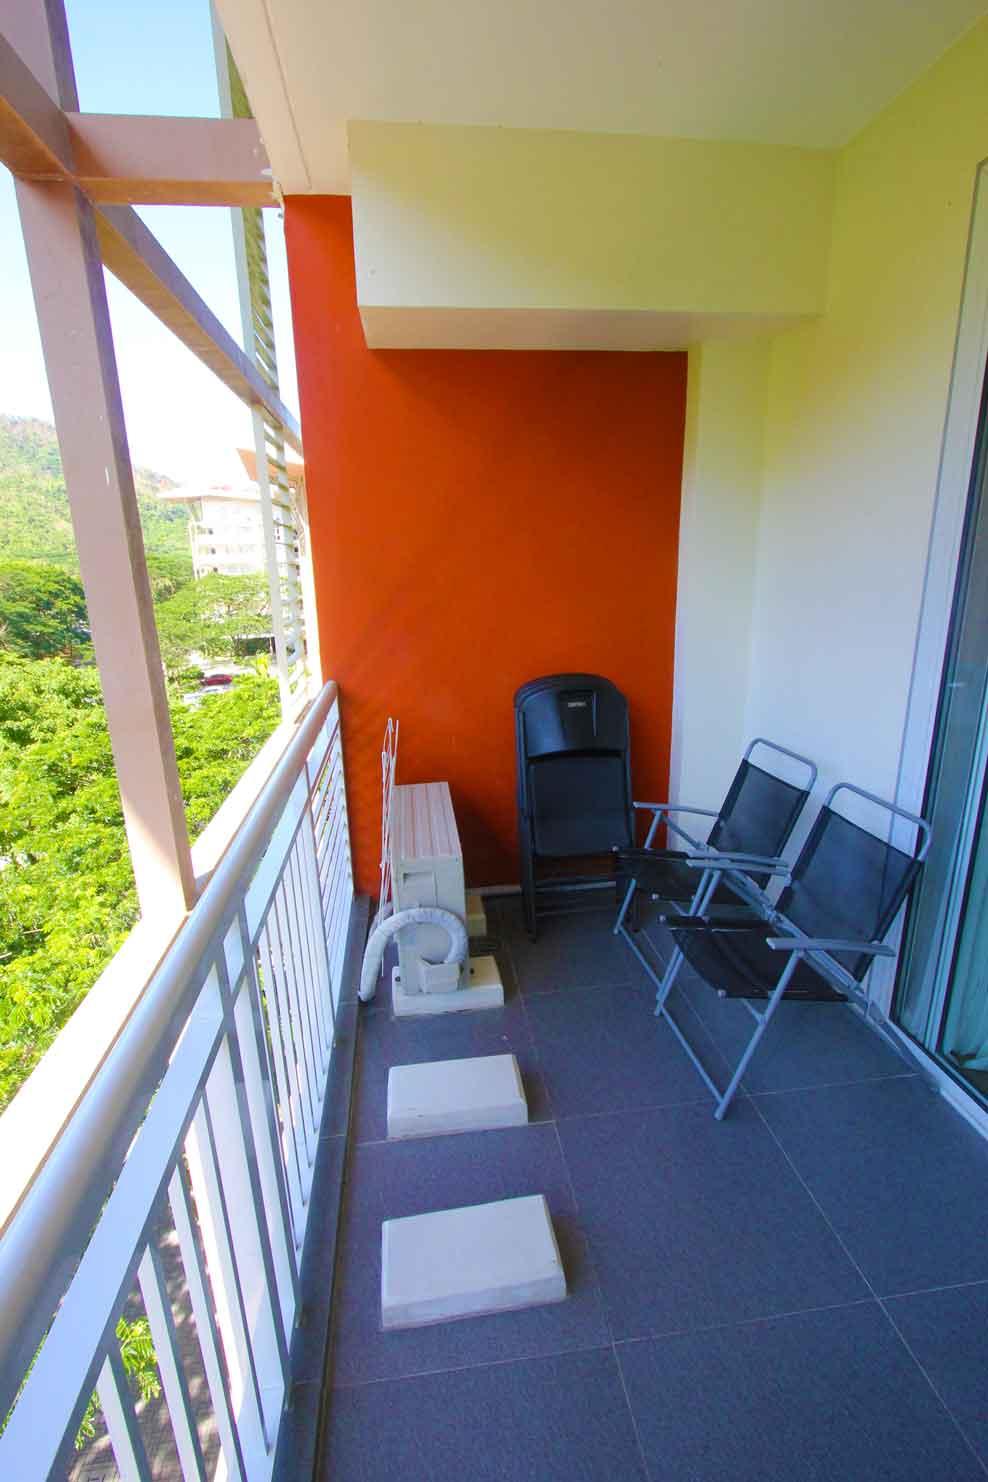 Hamilo Sample Images - myn balcony 1280 low.